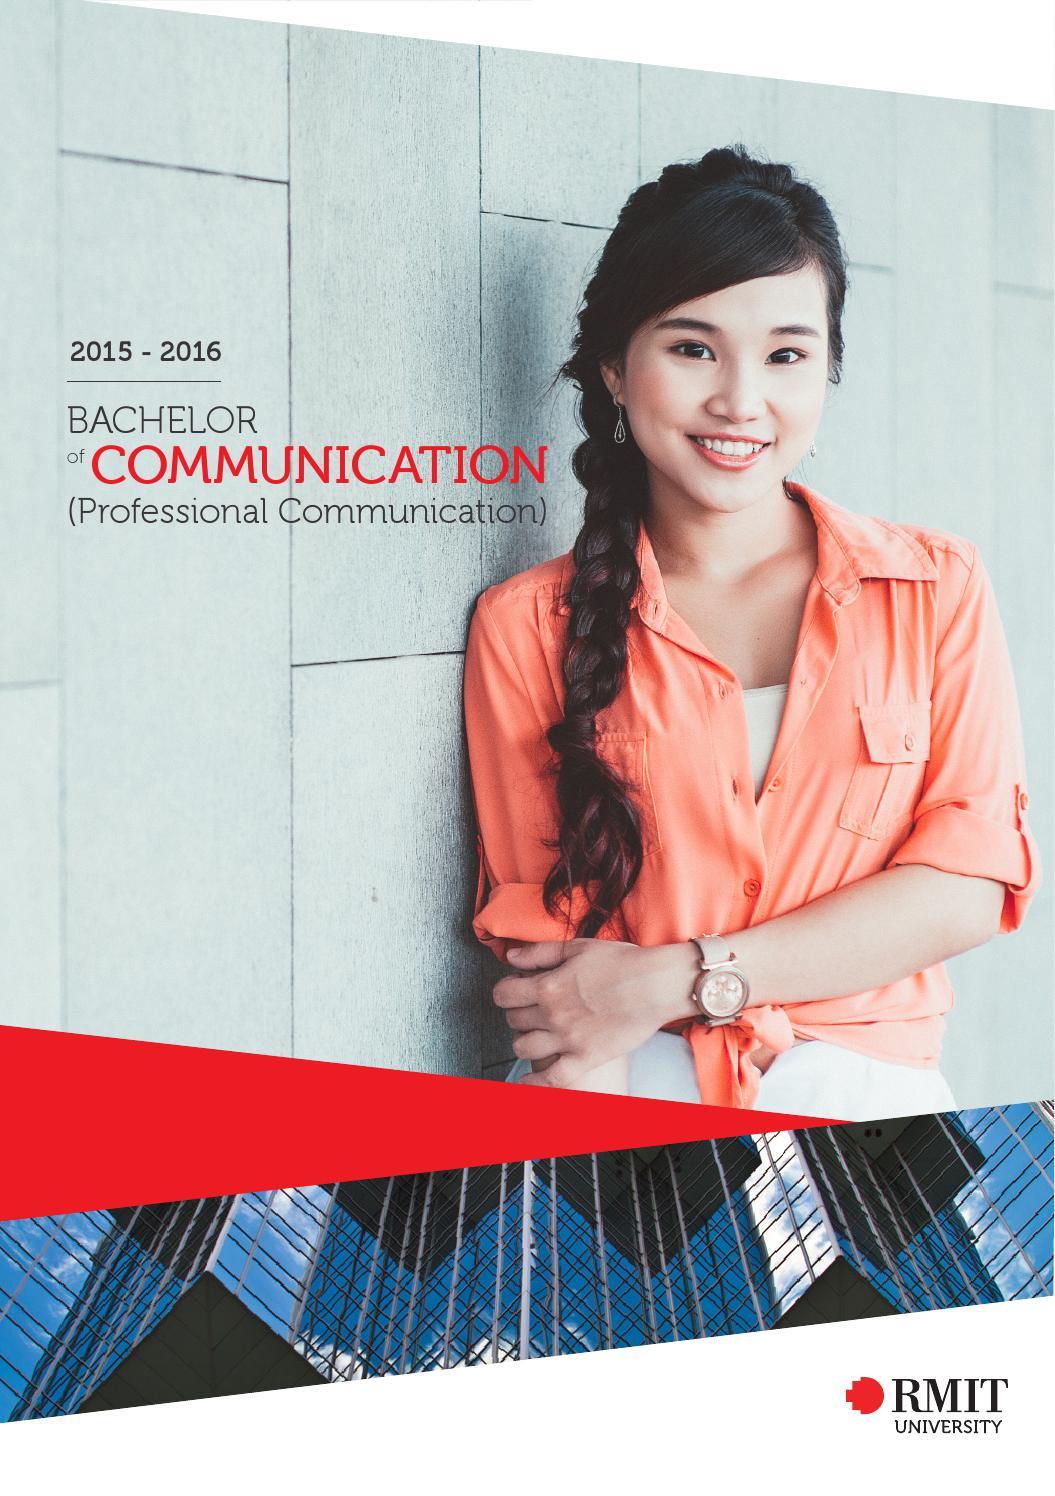 Rmit Bachelor Of Communication Professional Communication 2015 By Rmit Vietnam Press Office Issuu